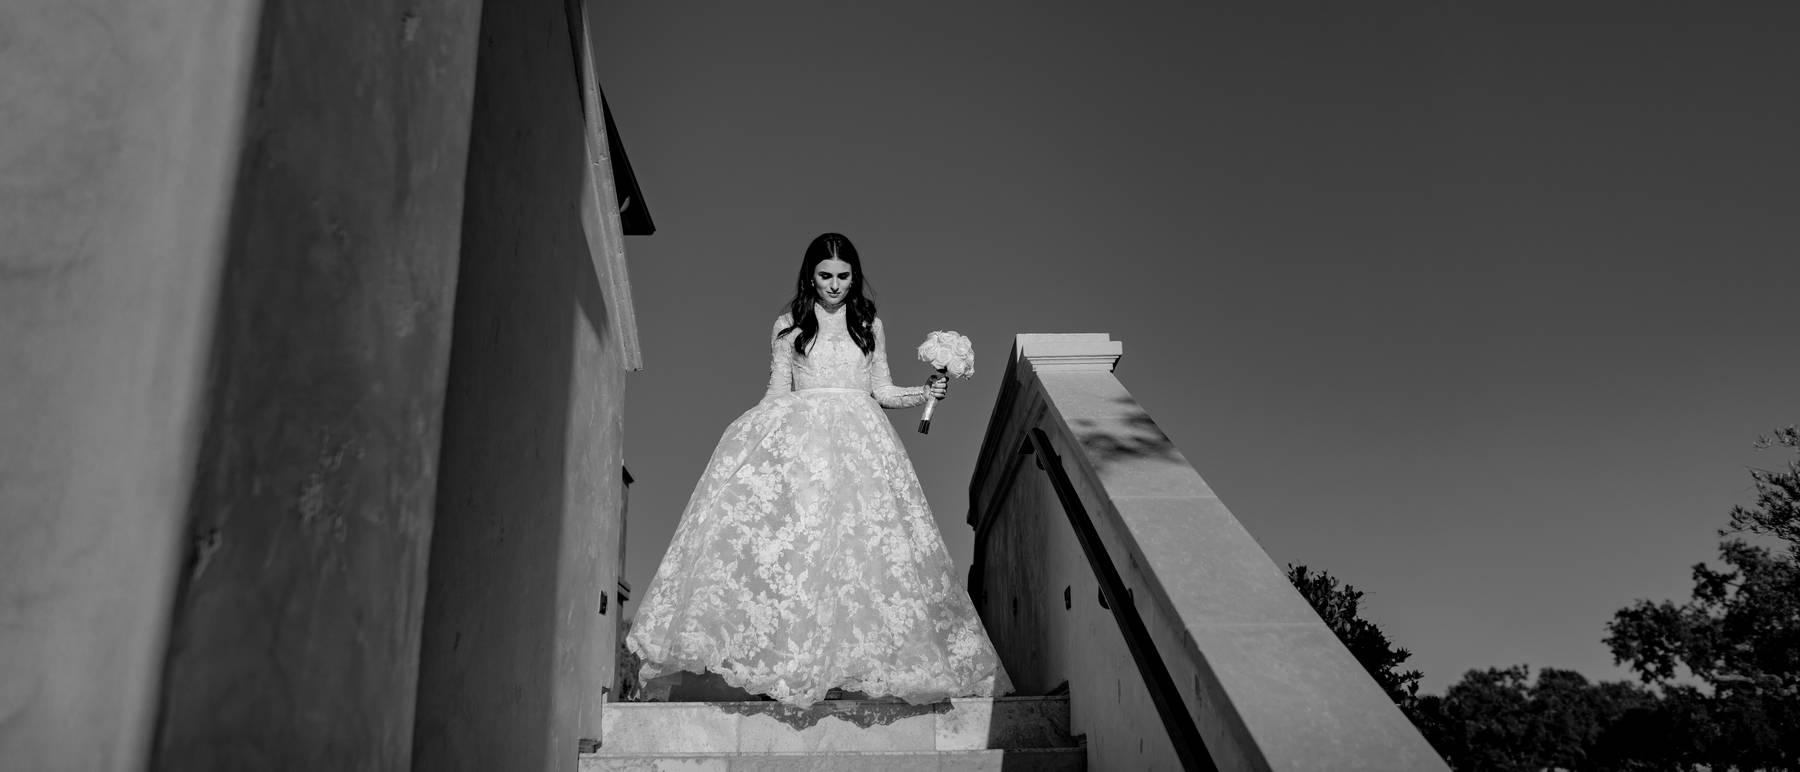 johnandjoseph-wedding-photographer-hz-slider-257